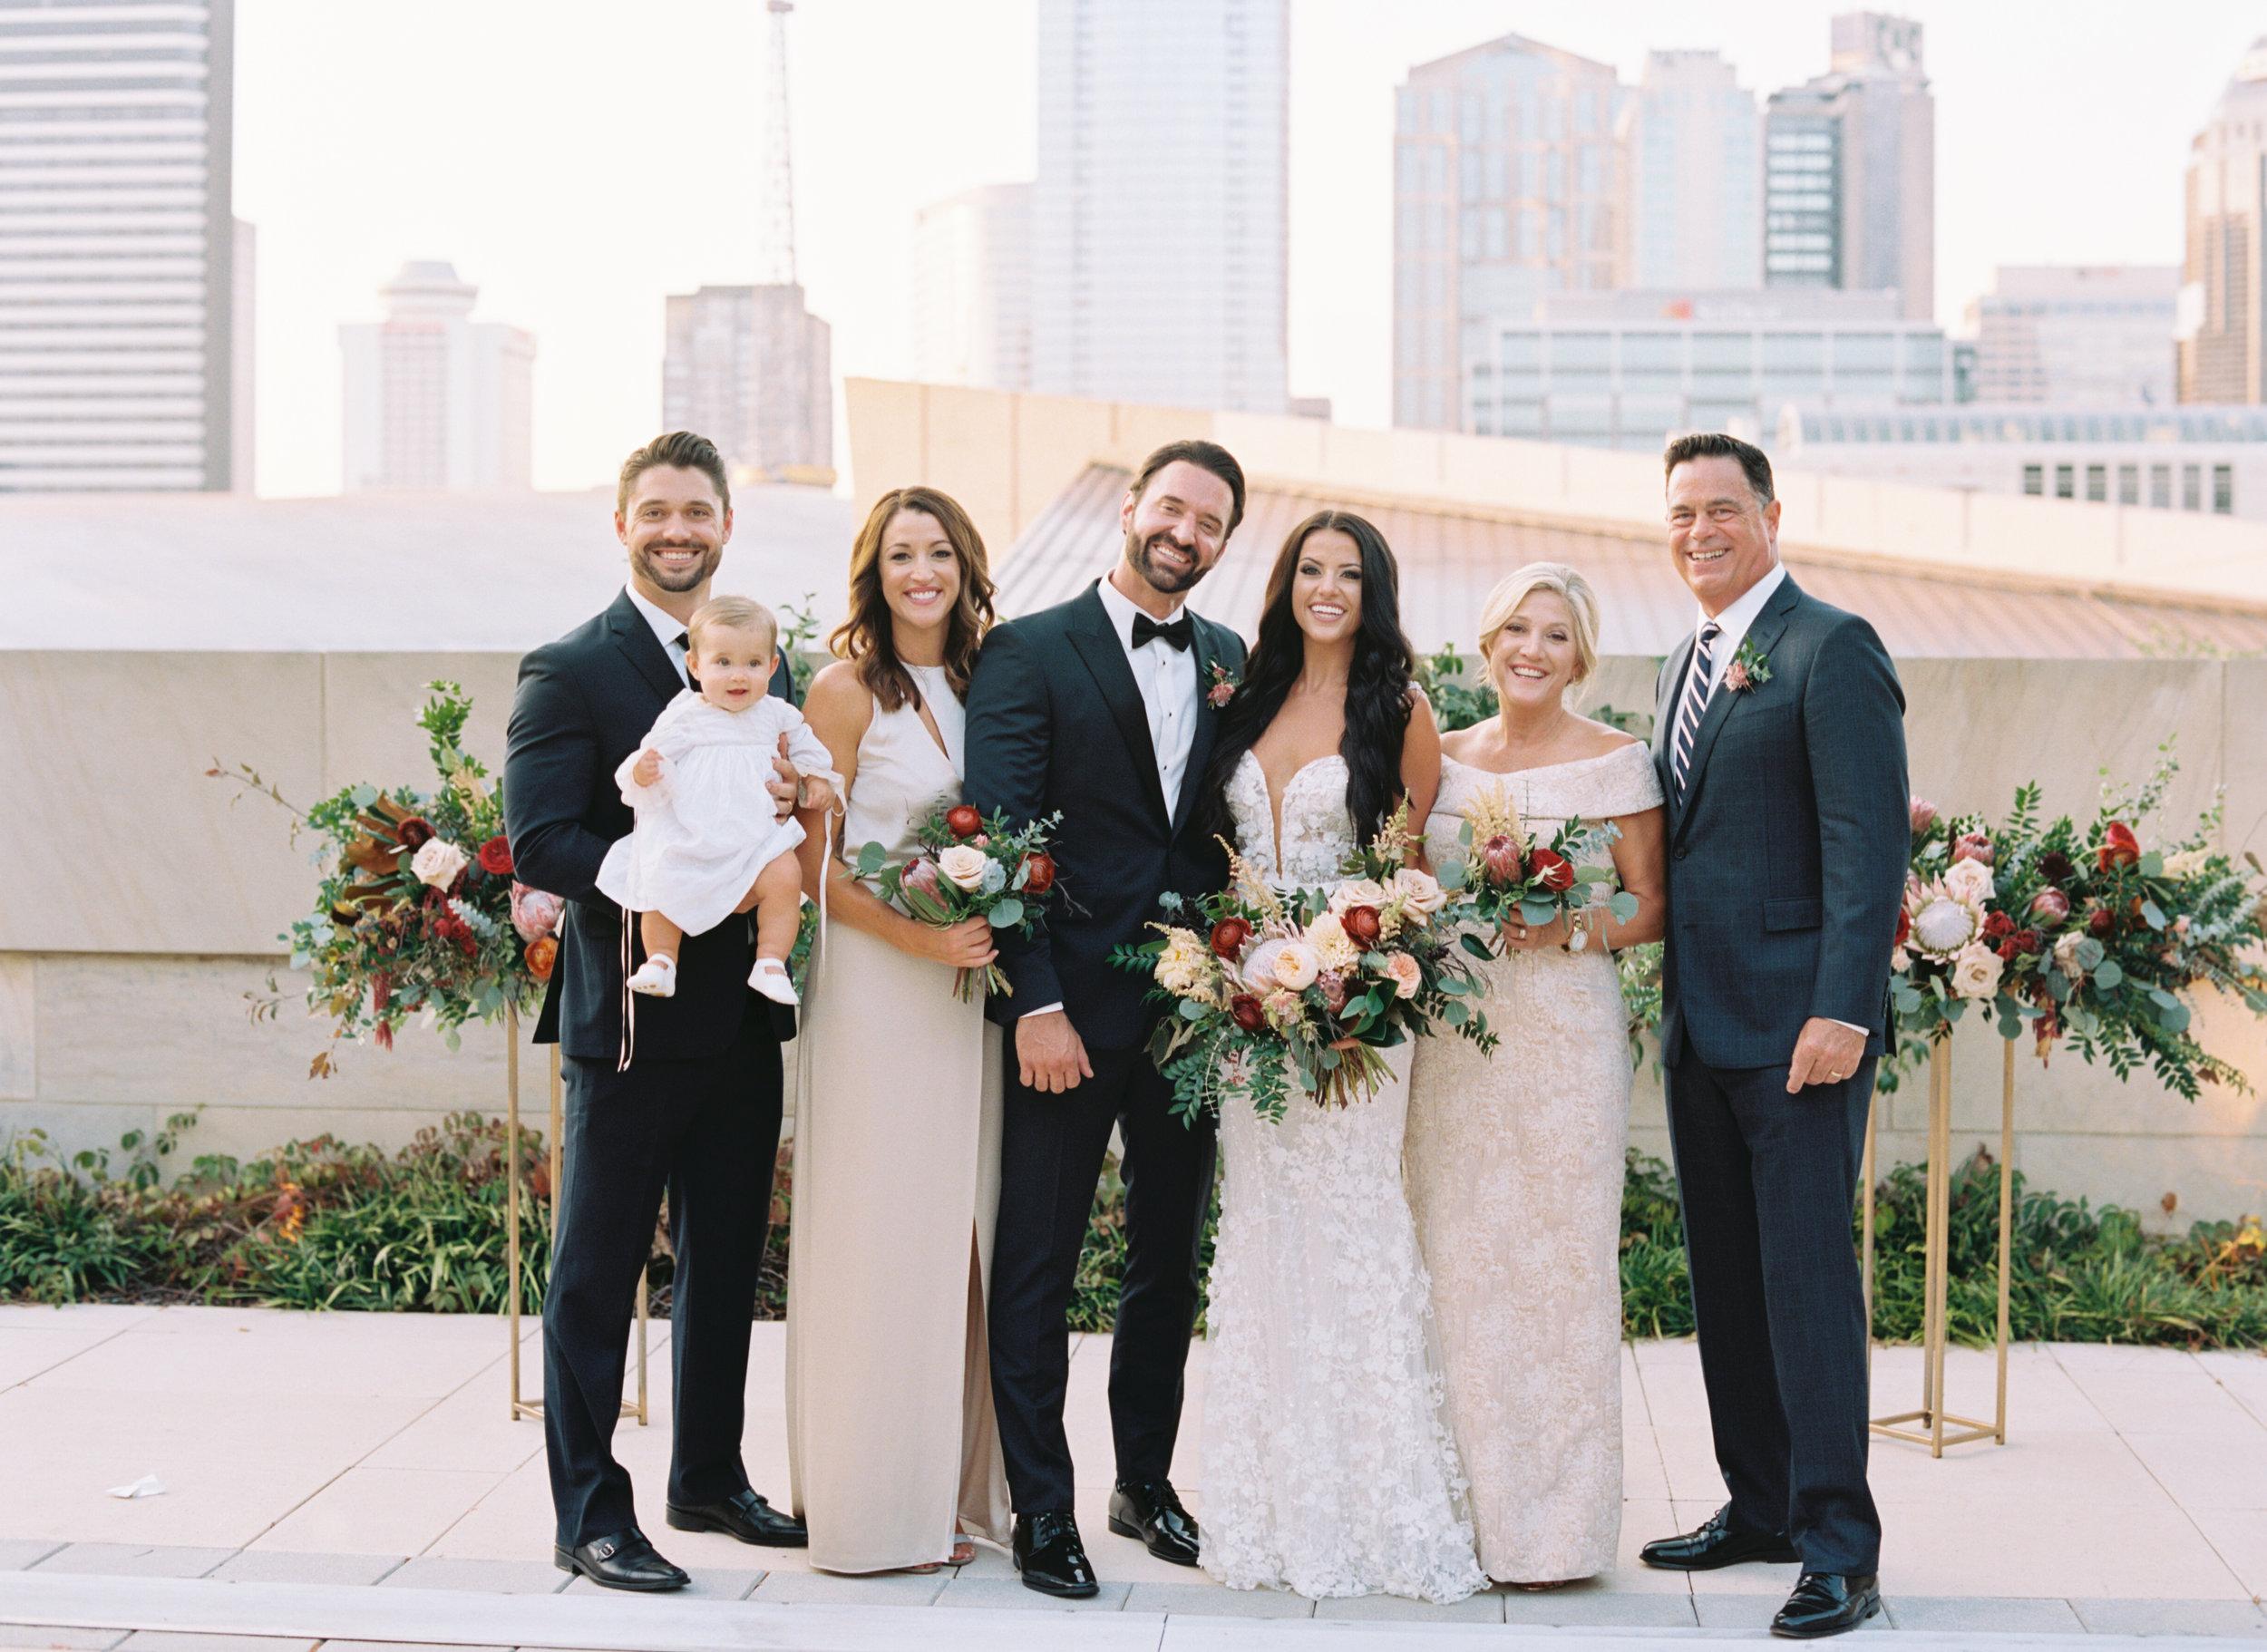 Family portraits with the Nashville skyline // Lush, untamed wedding flowers